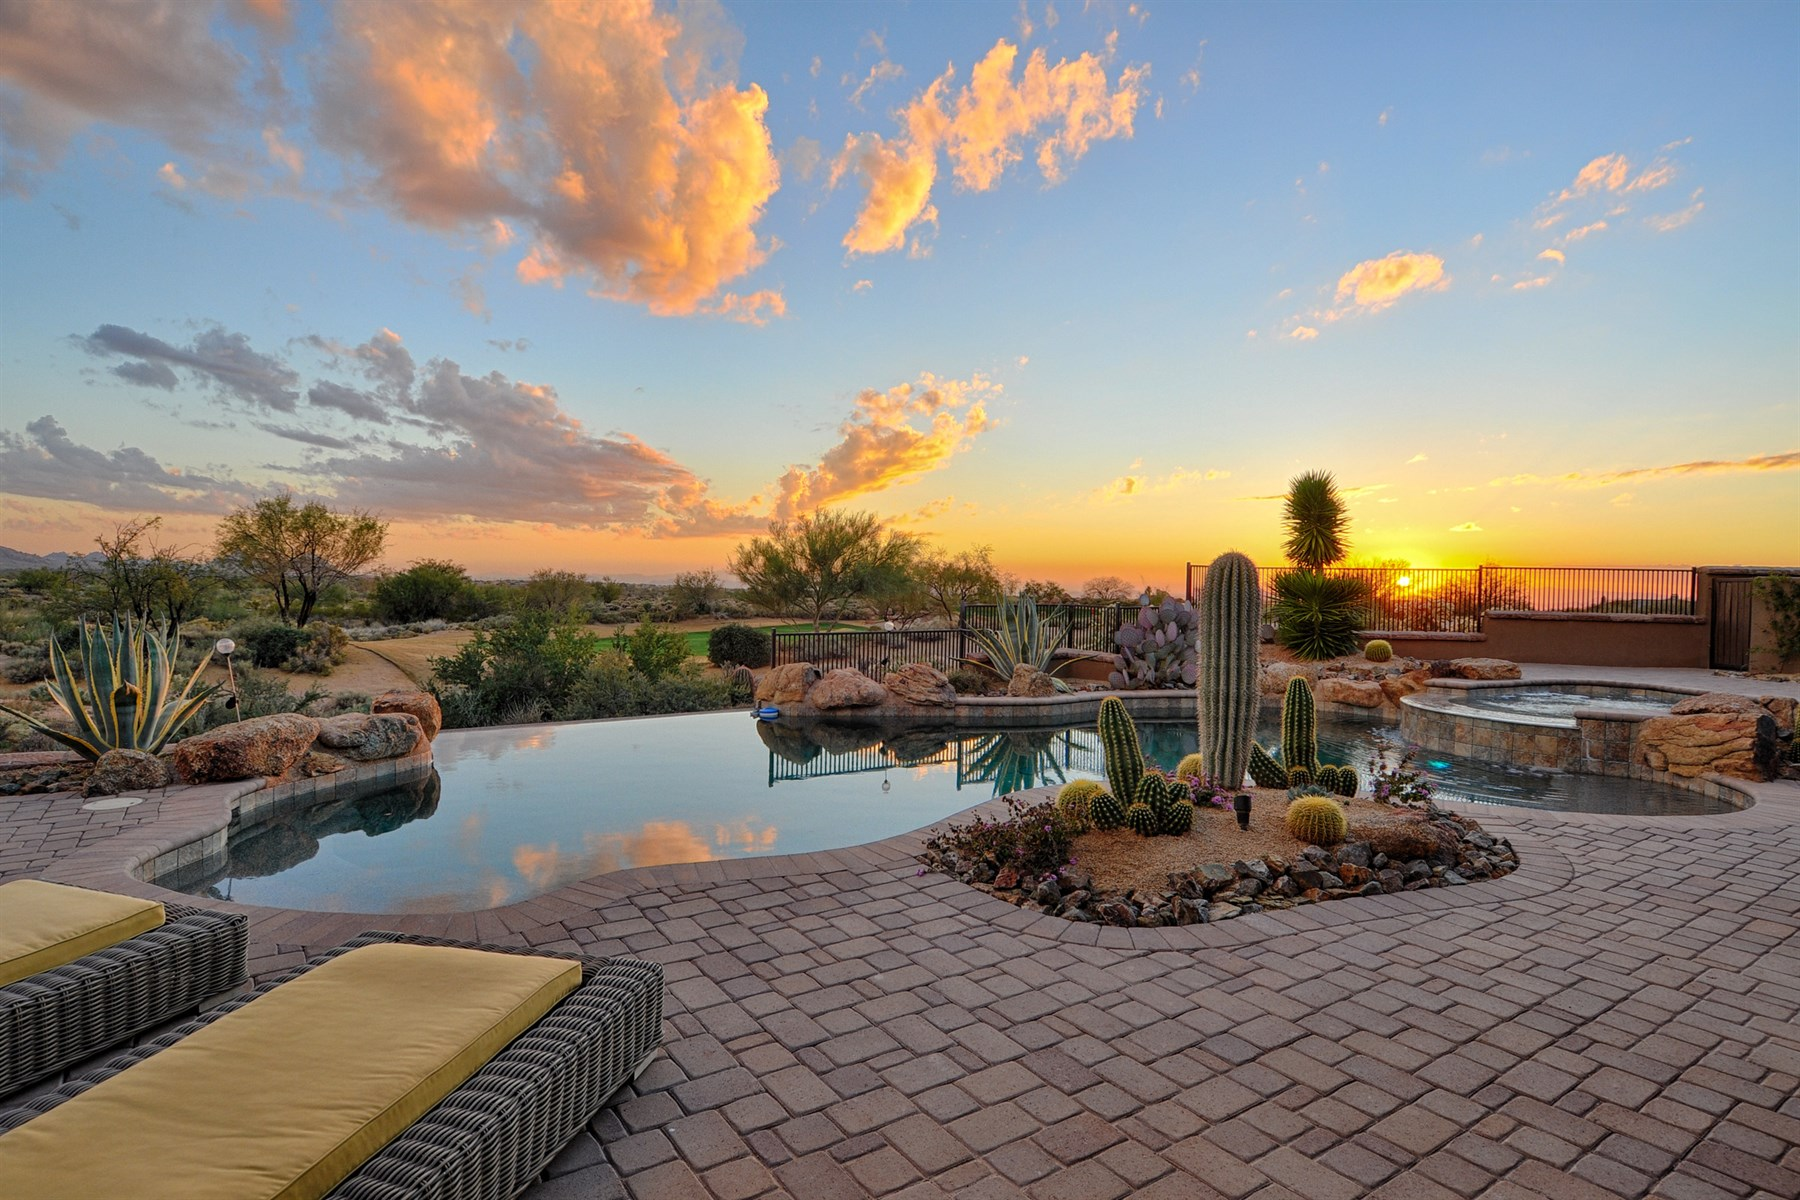 Villa per Vendita alle ore beautiful custom home sits high over the 15th hole at Mirabel Country Club 36322 N 100th Way Scottsdale, Arizona 85262 Stati Uniti